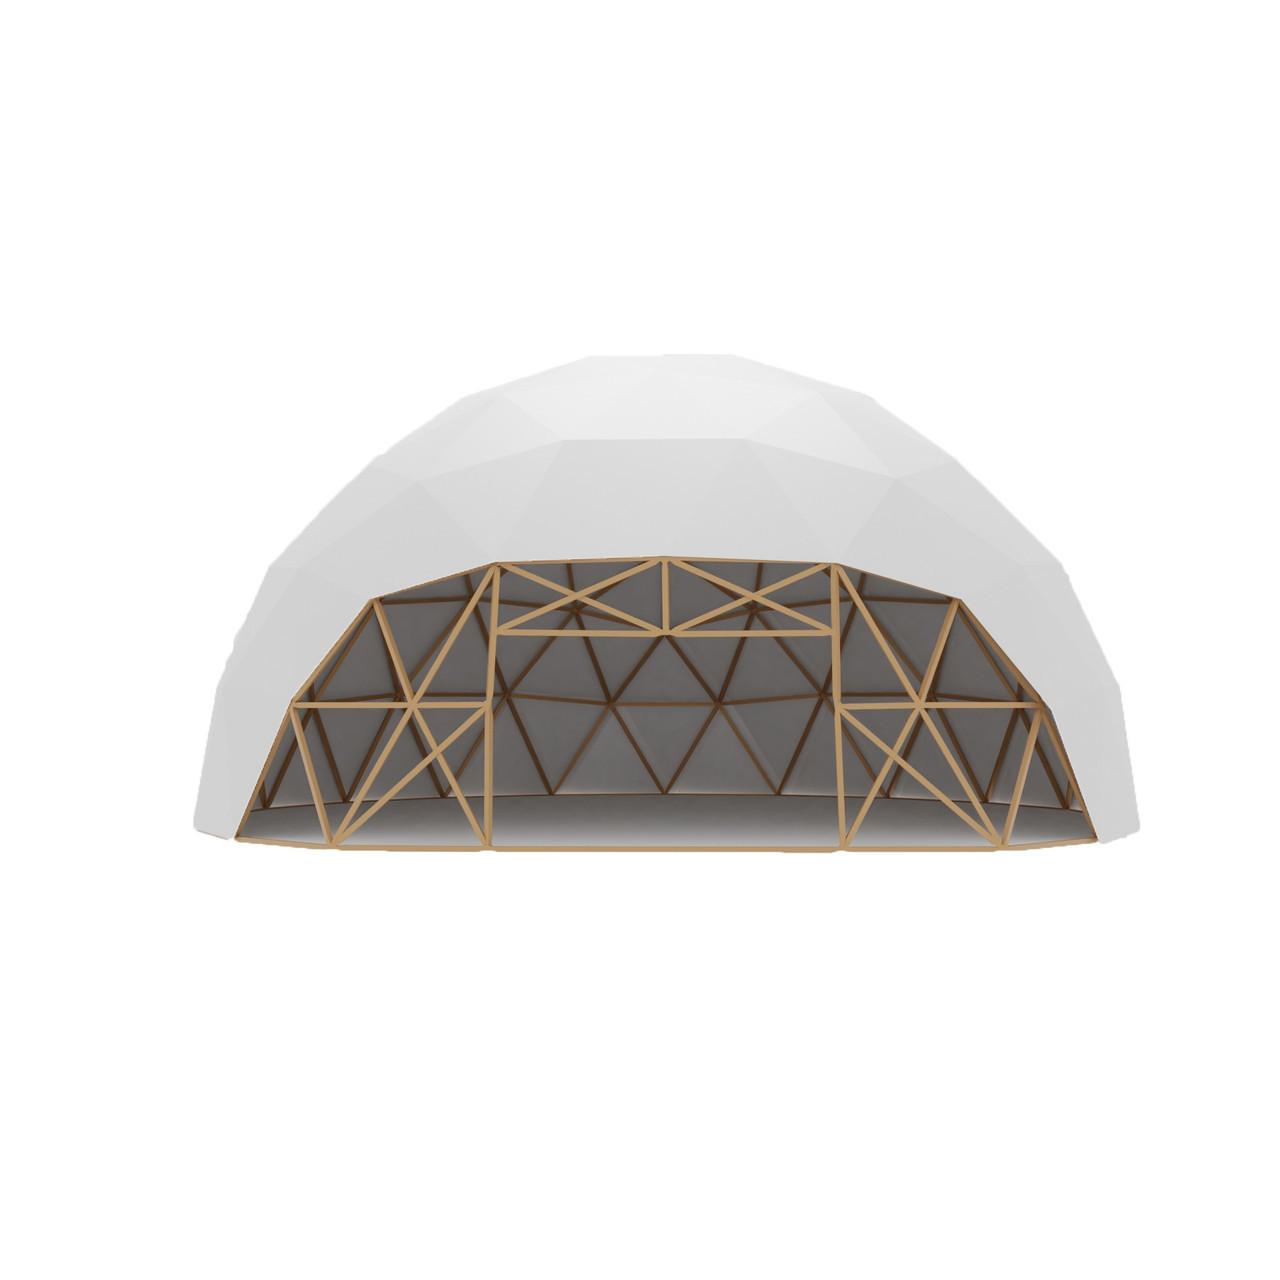 Сферический шатер диаметр 6 м